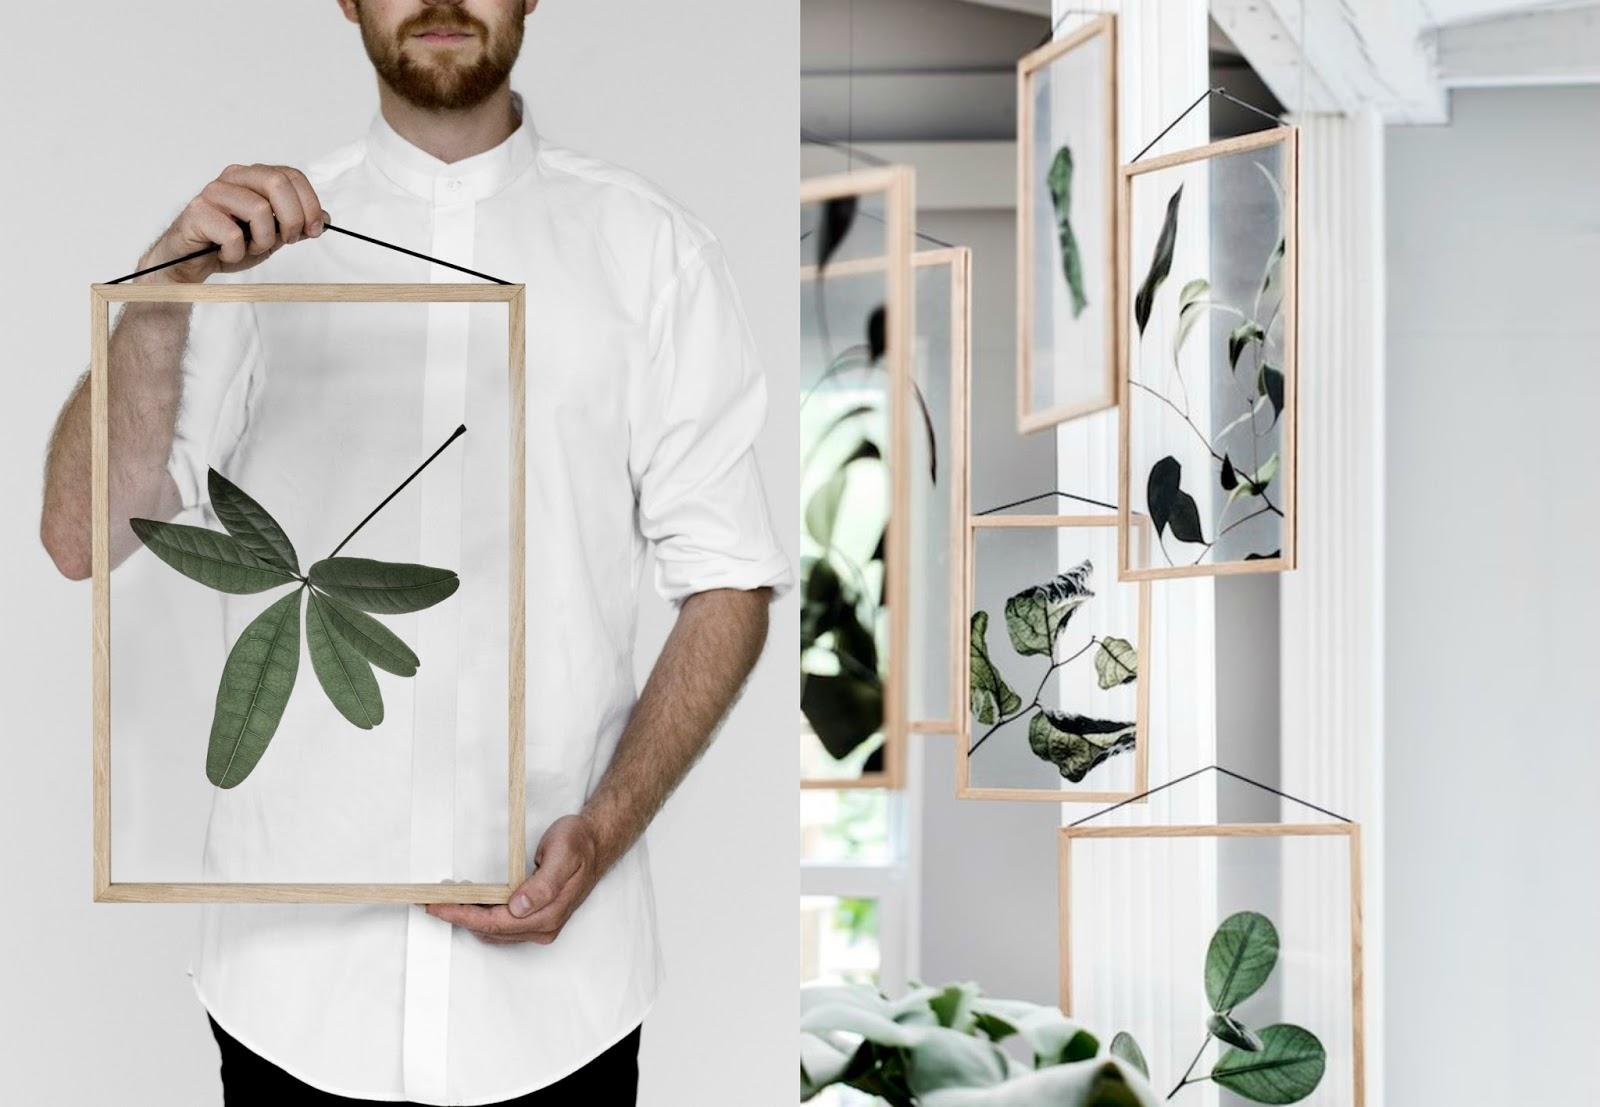 Naturalne dekoracje do mieszkania